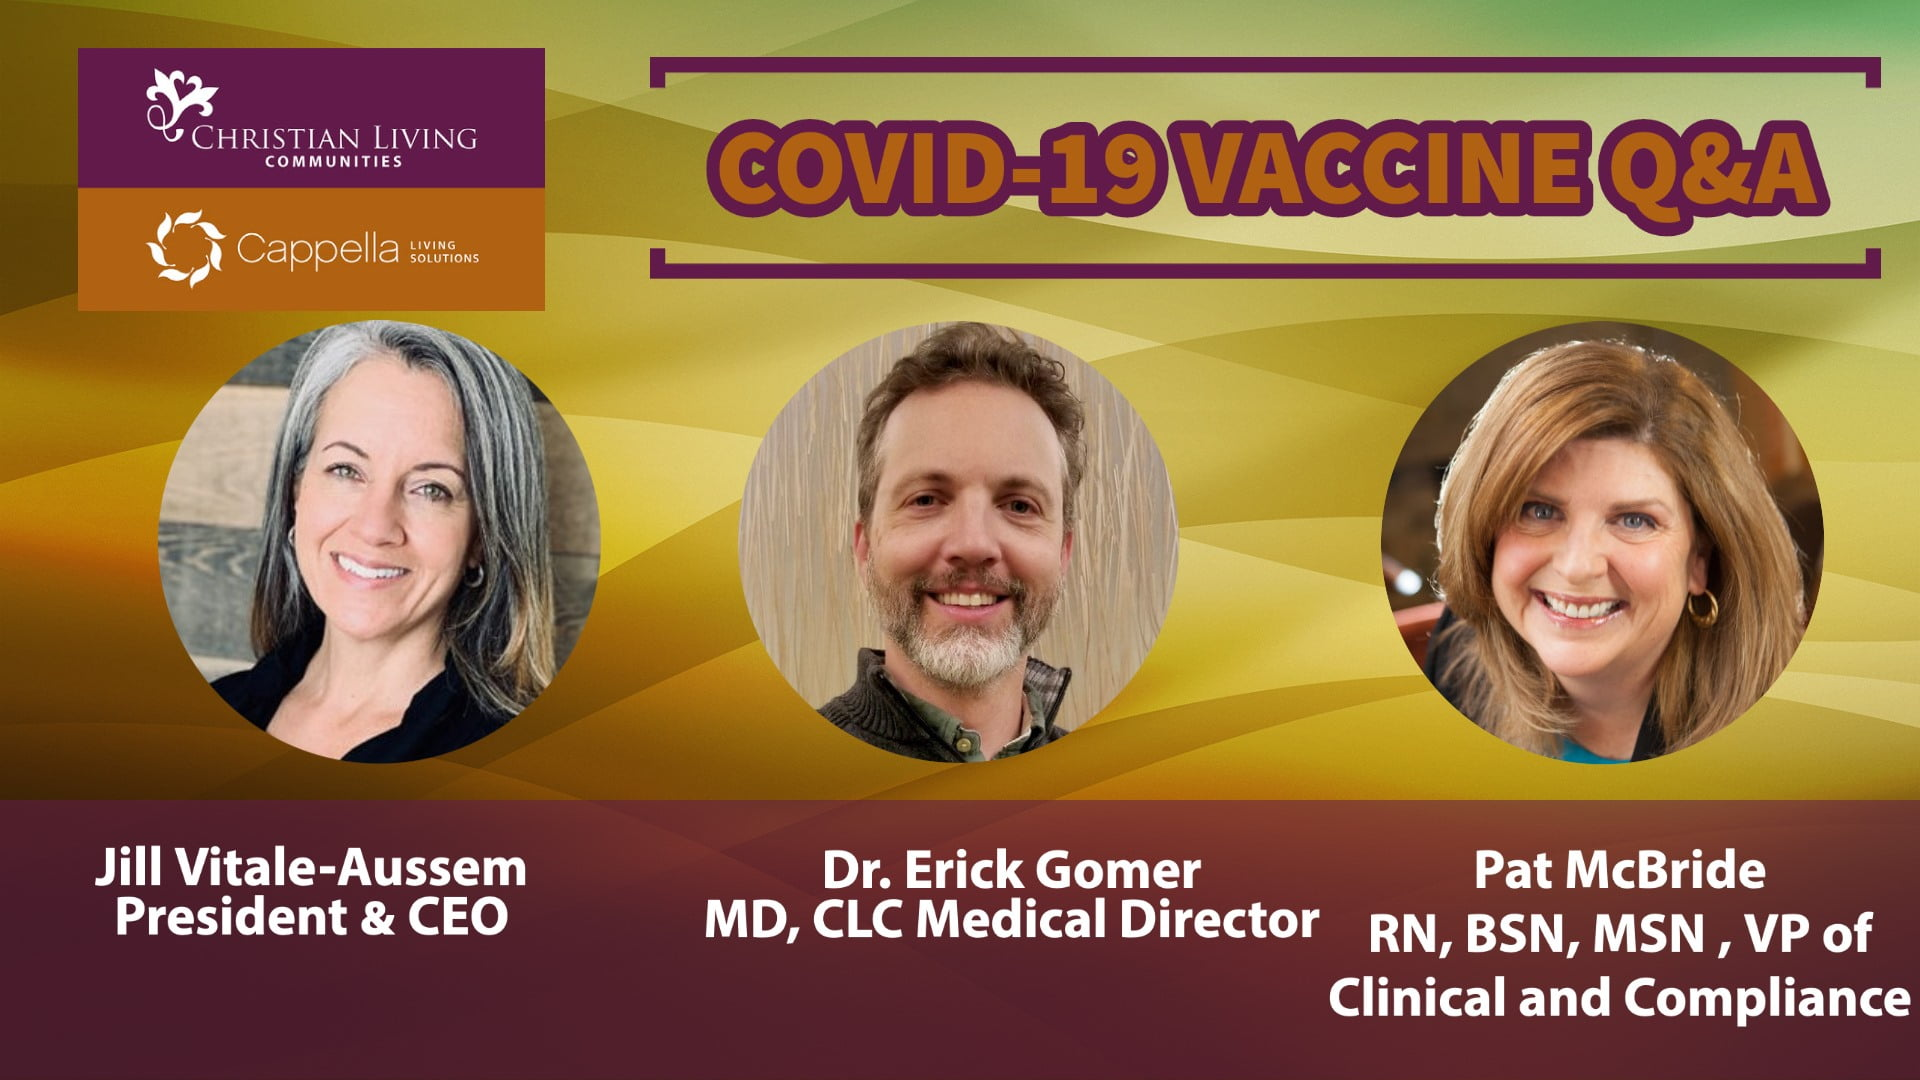 COVID-19 Vaccine Q&A banner